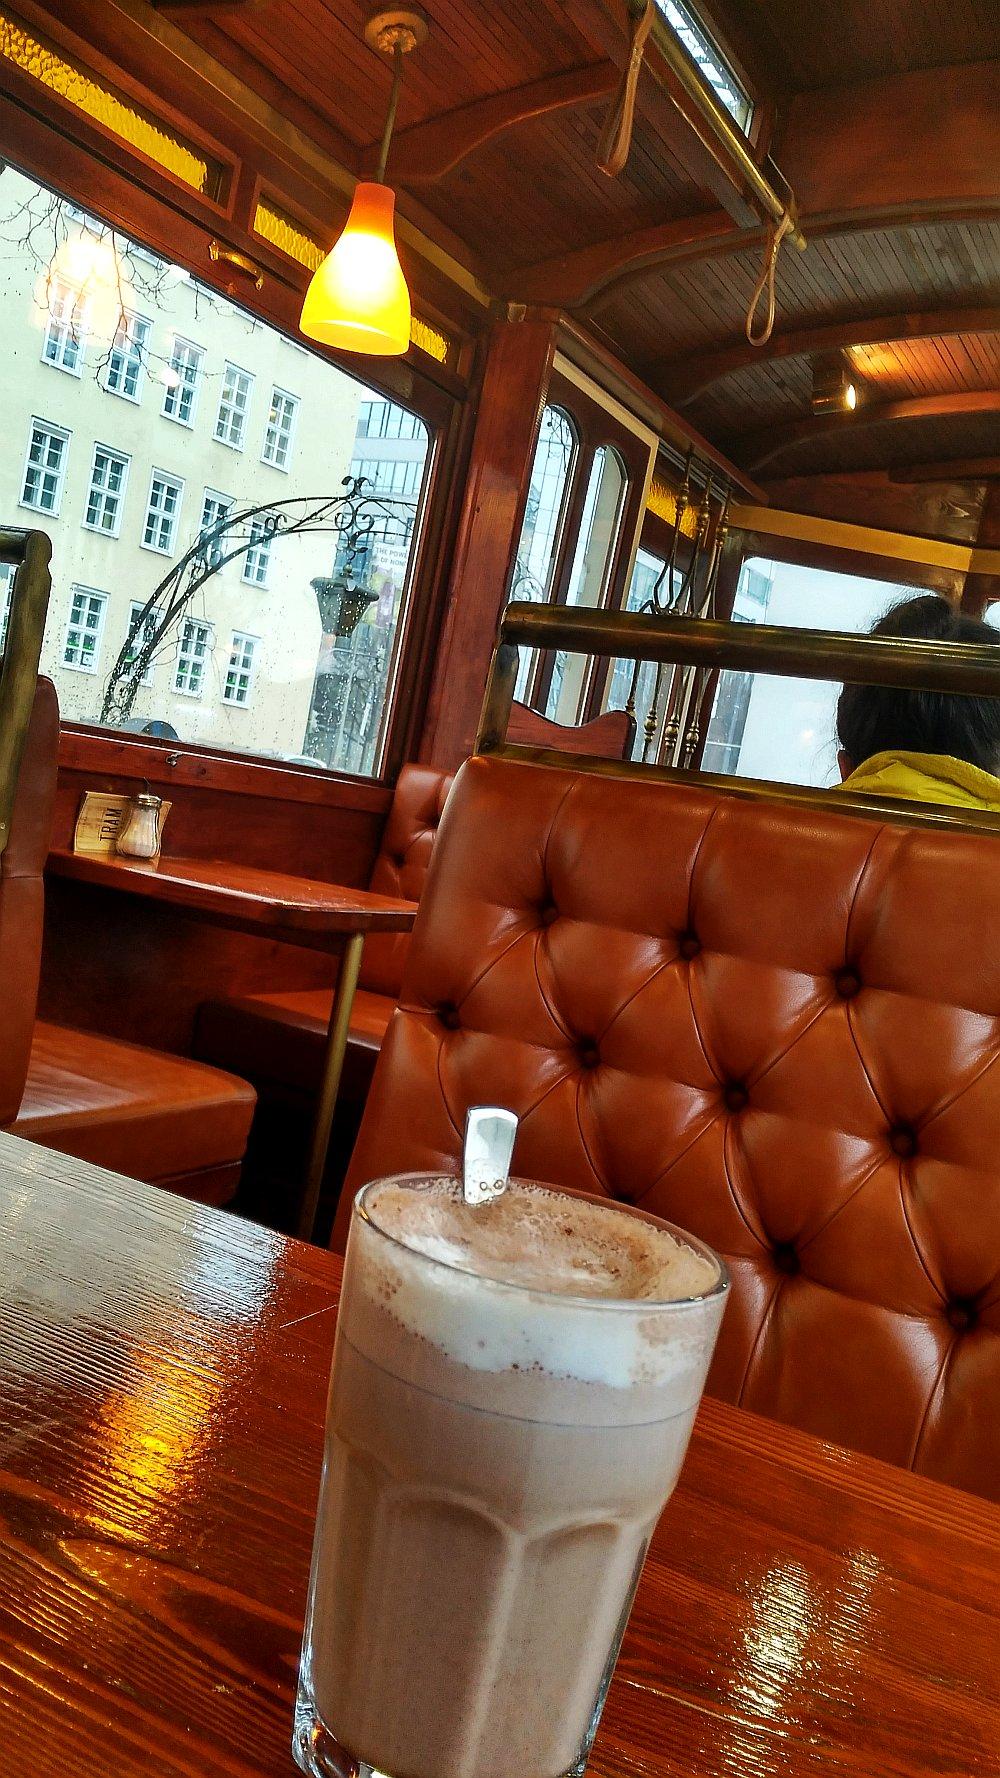 tramcafe2